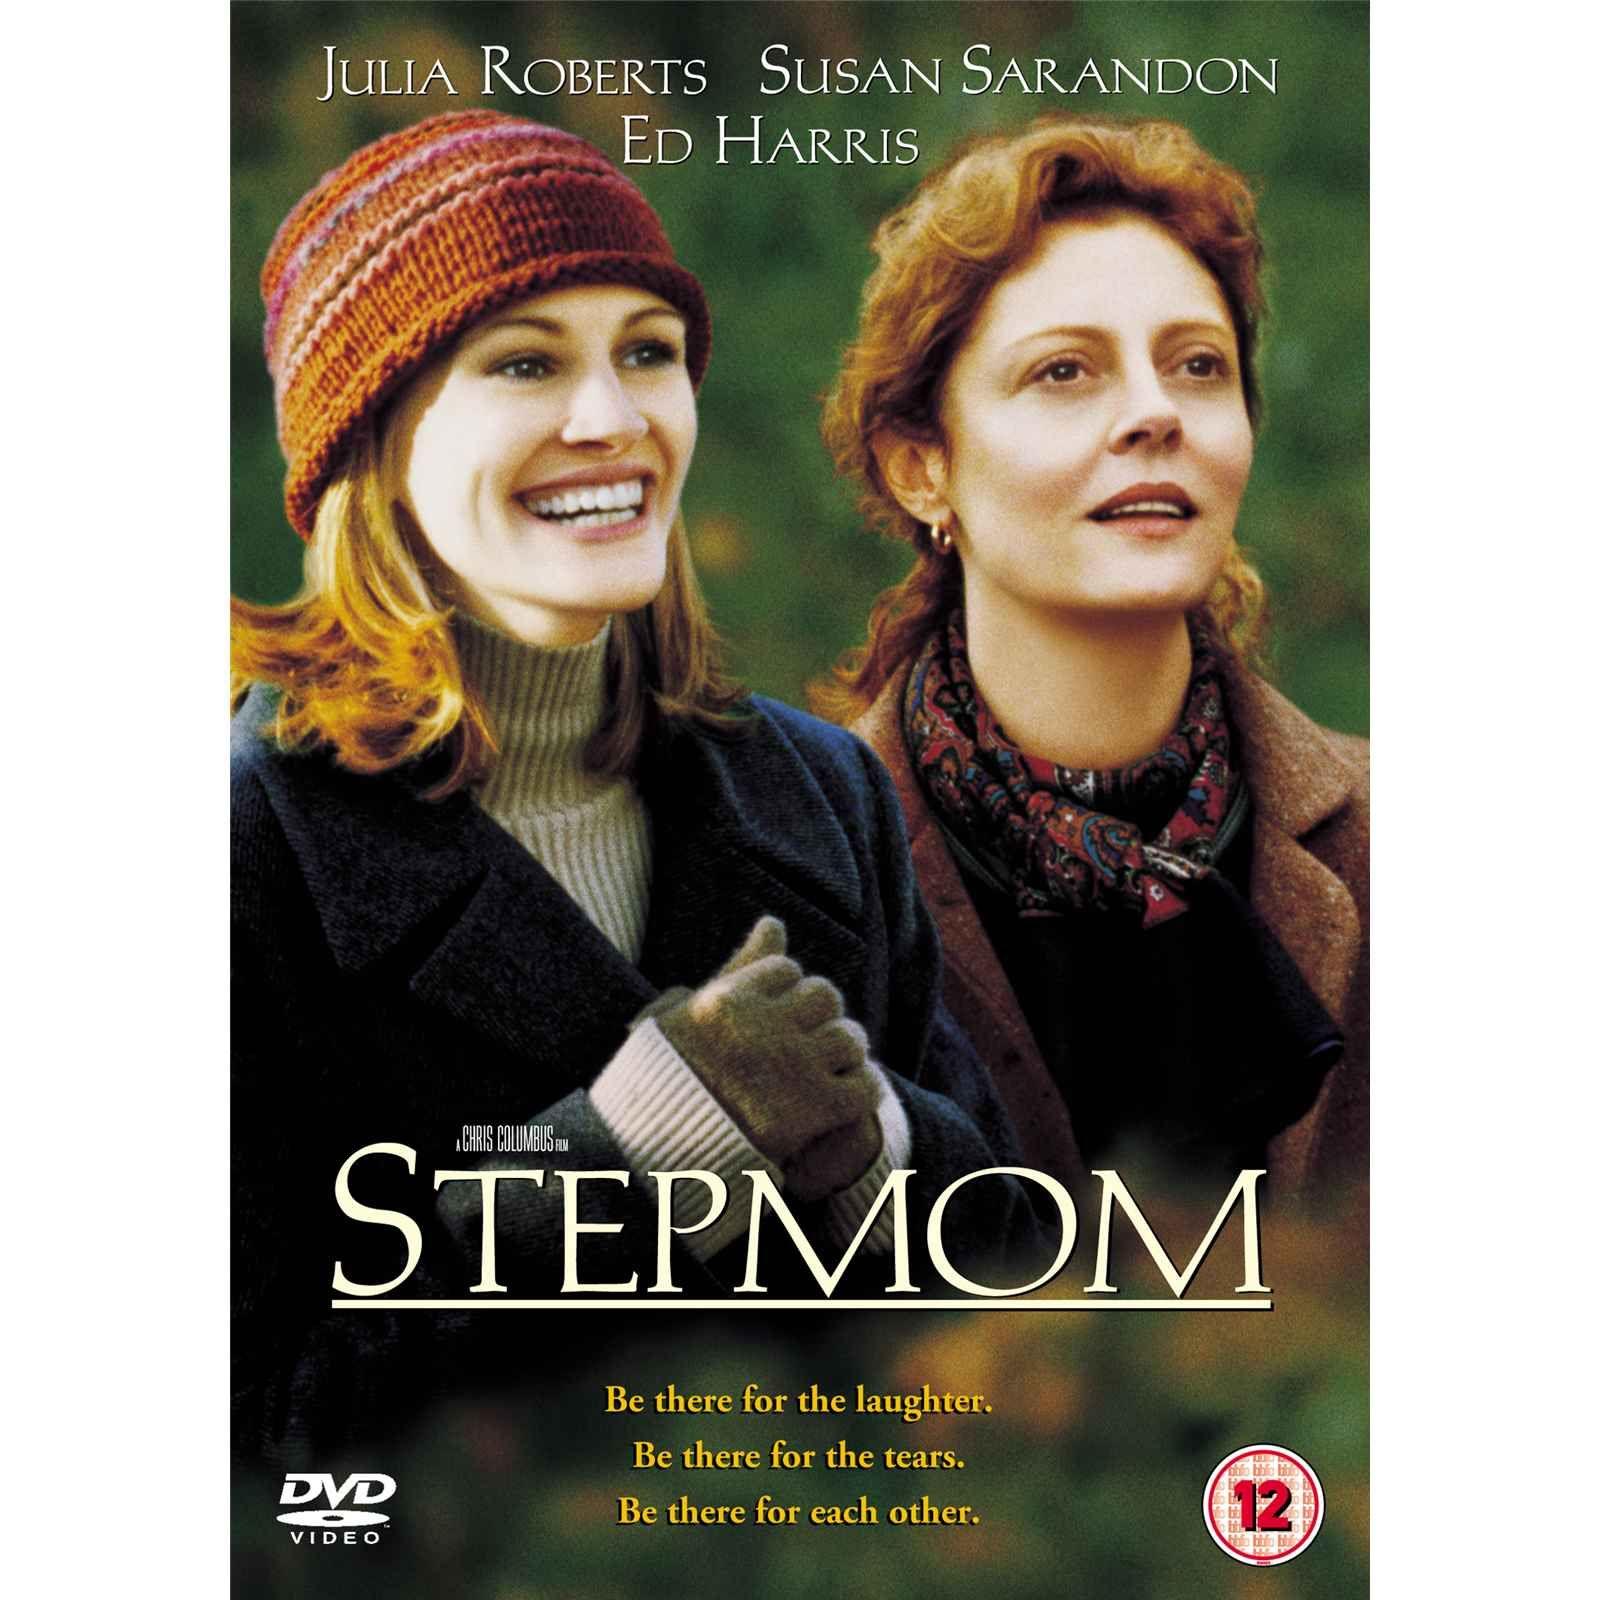 step mom Julia roberts and ed harris in stepmom (1998) susan sarandon in stepmom ( 1998) director chris columbus susan sarandon and ed harris in stepmom.